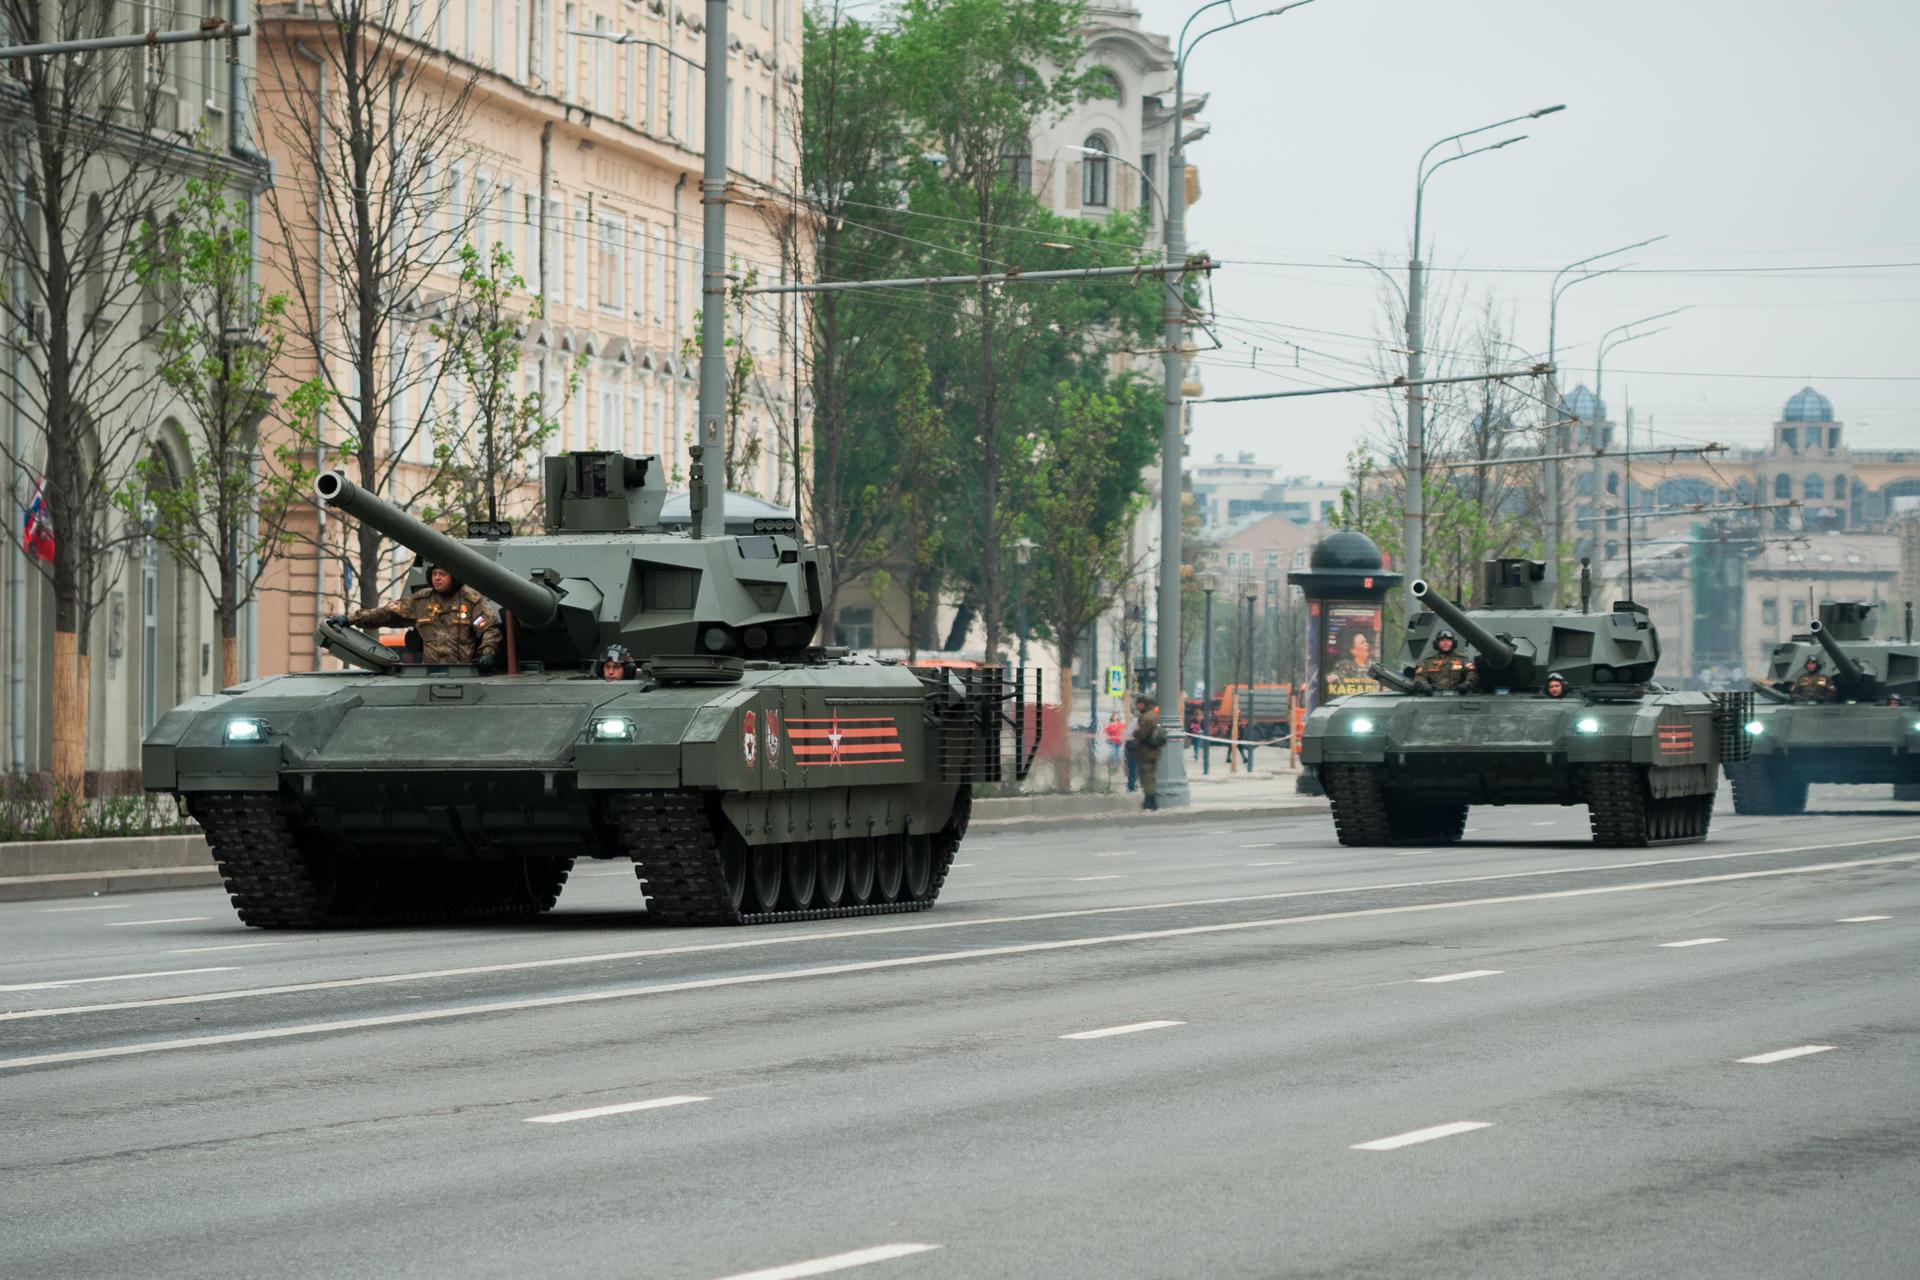 Russische T-14 Armata tanks